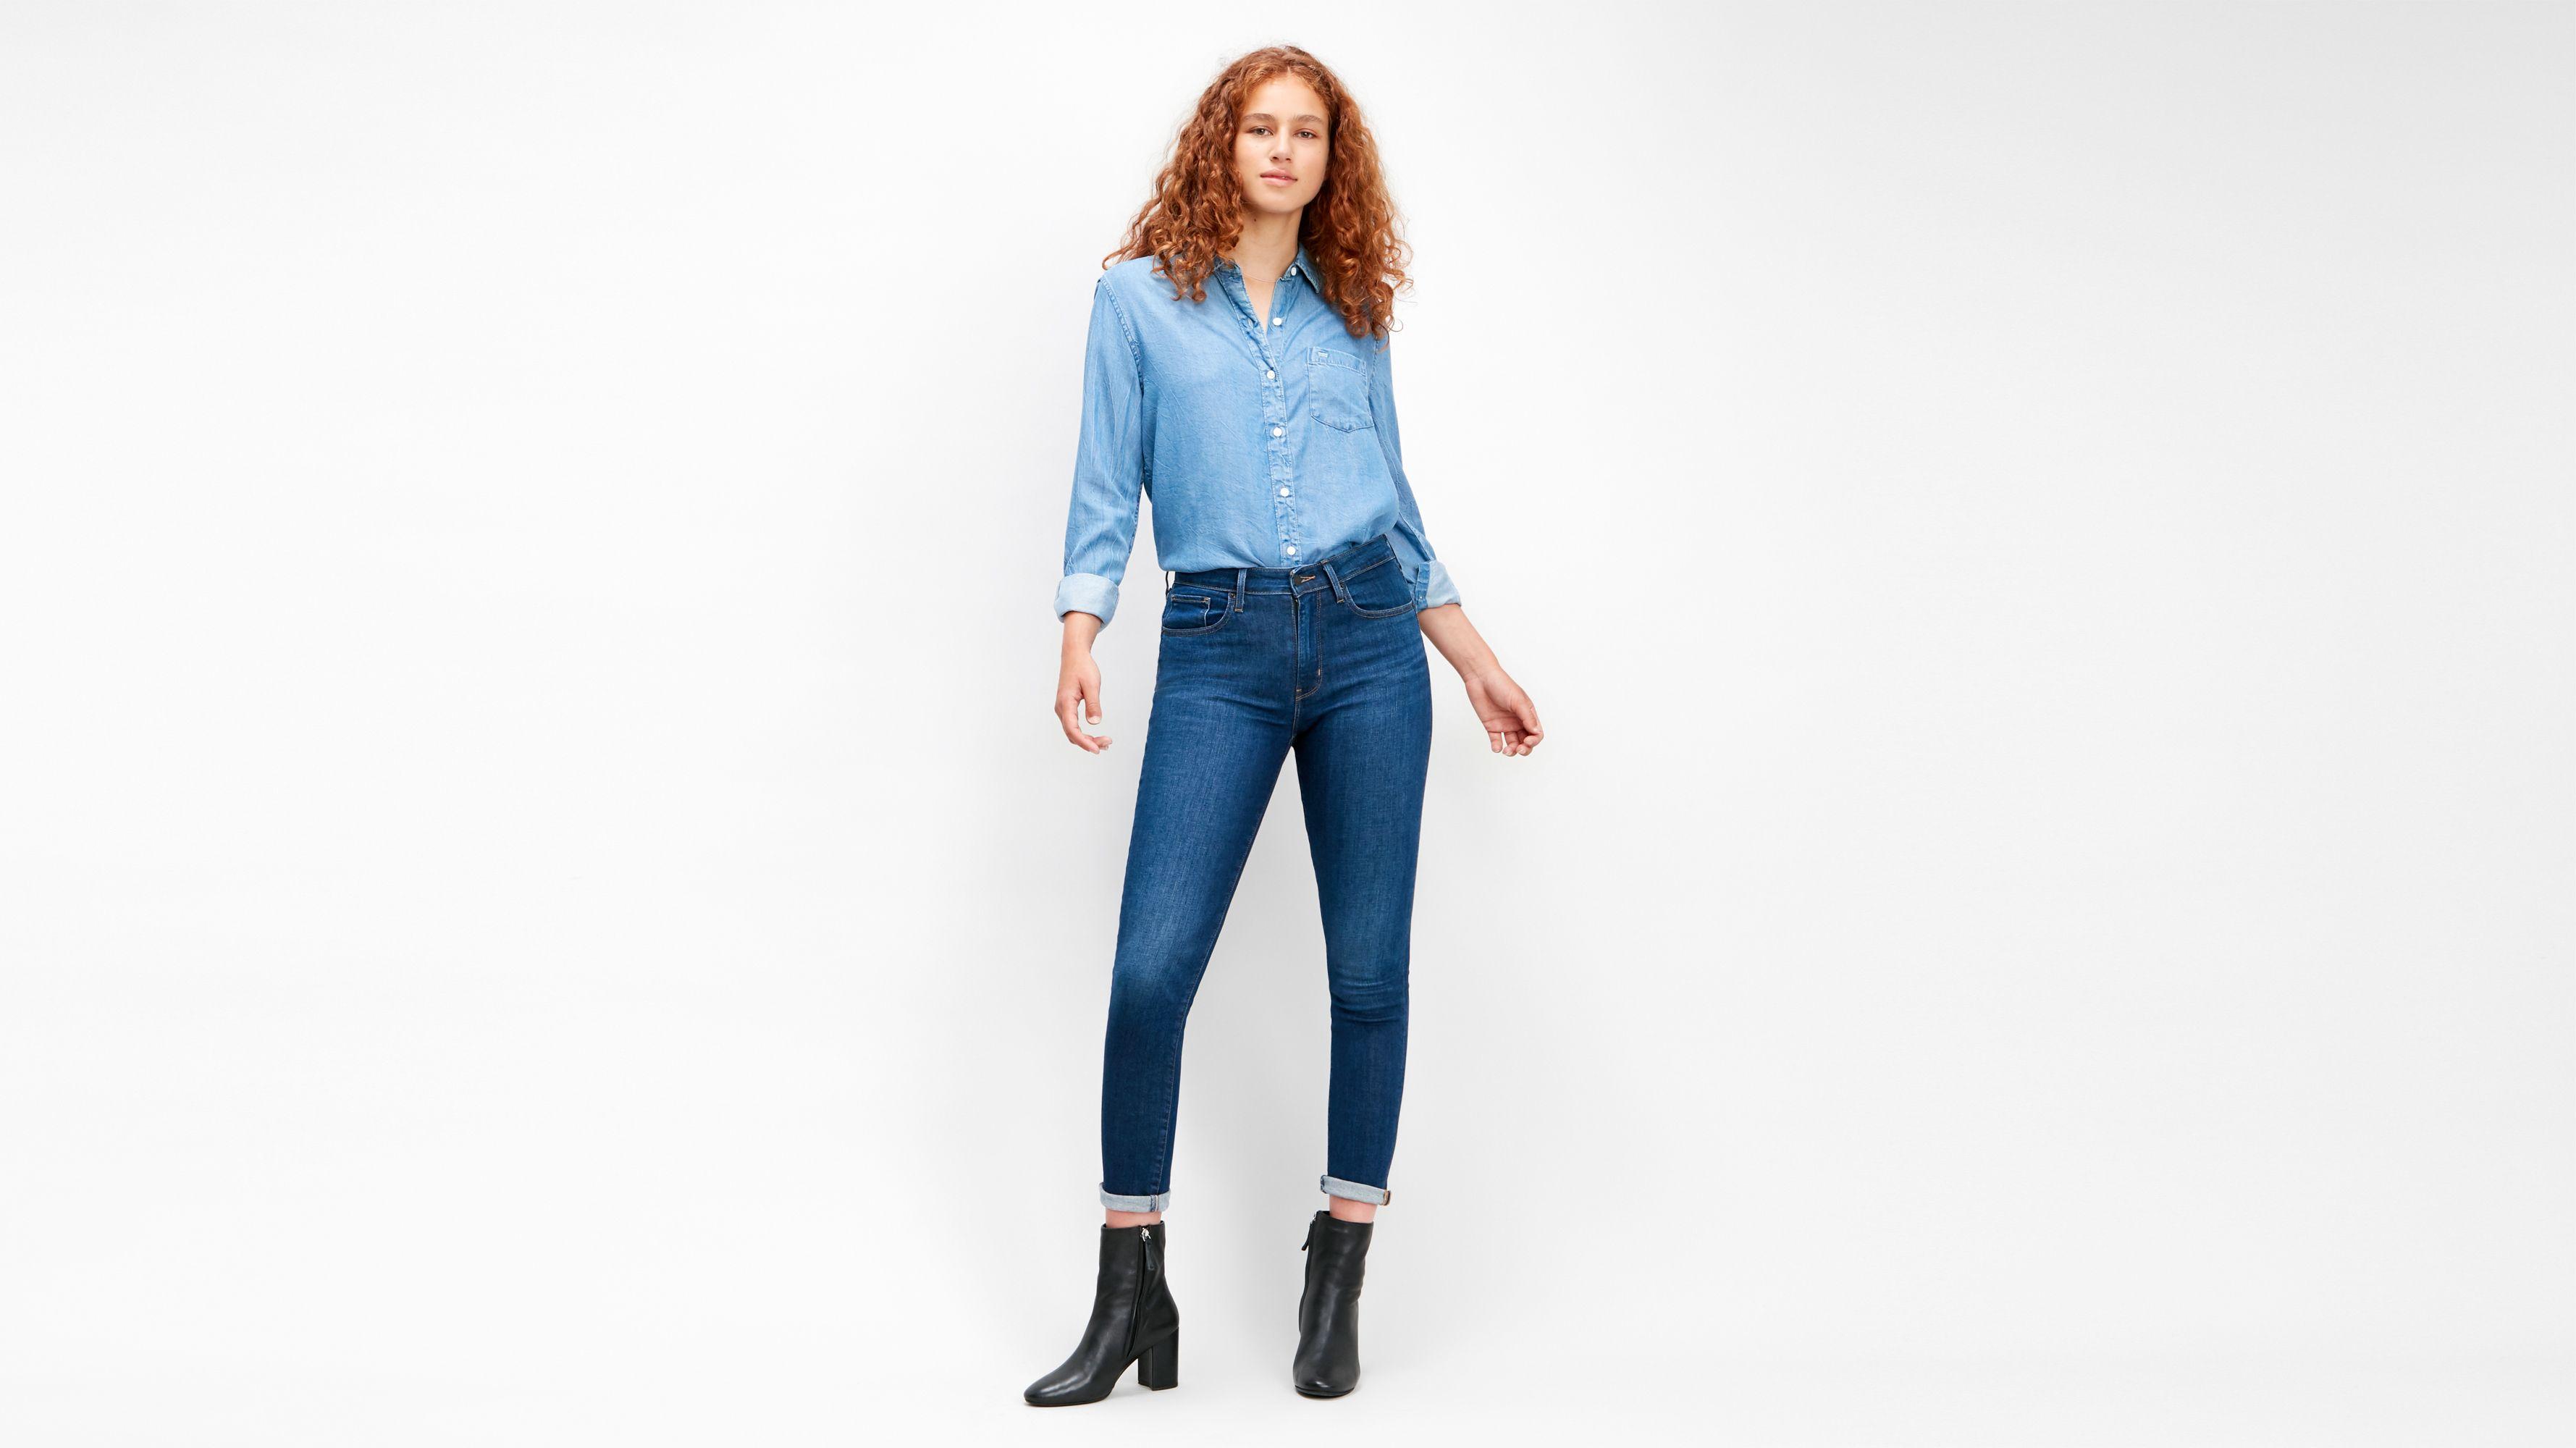 721™ High Rise Skinny Jeans Blauw | Levi's® NL